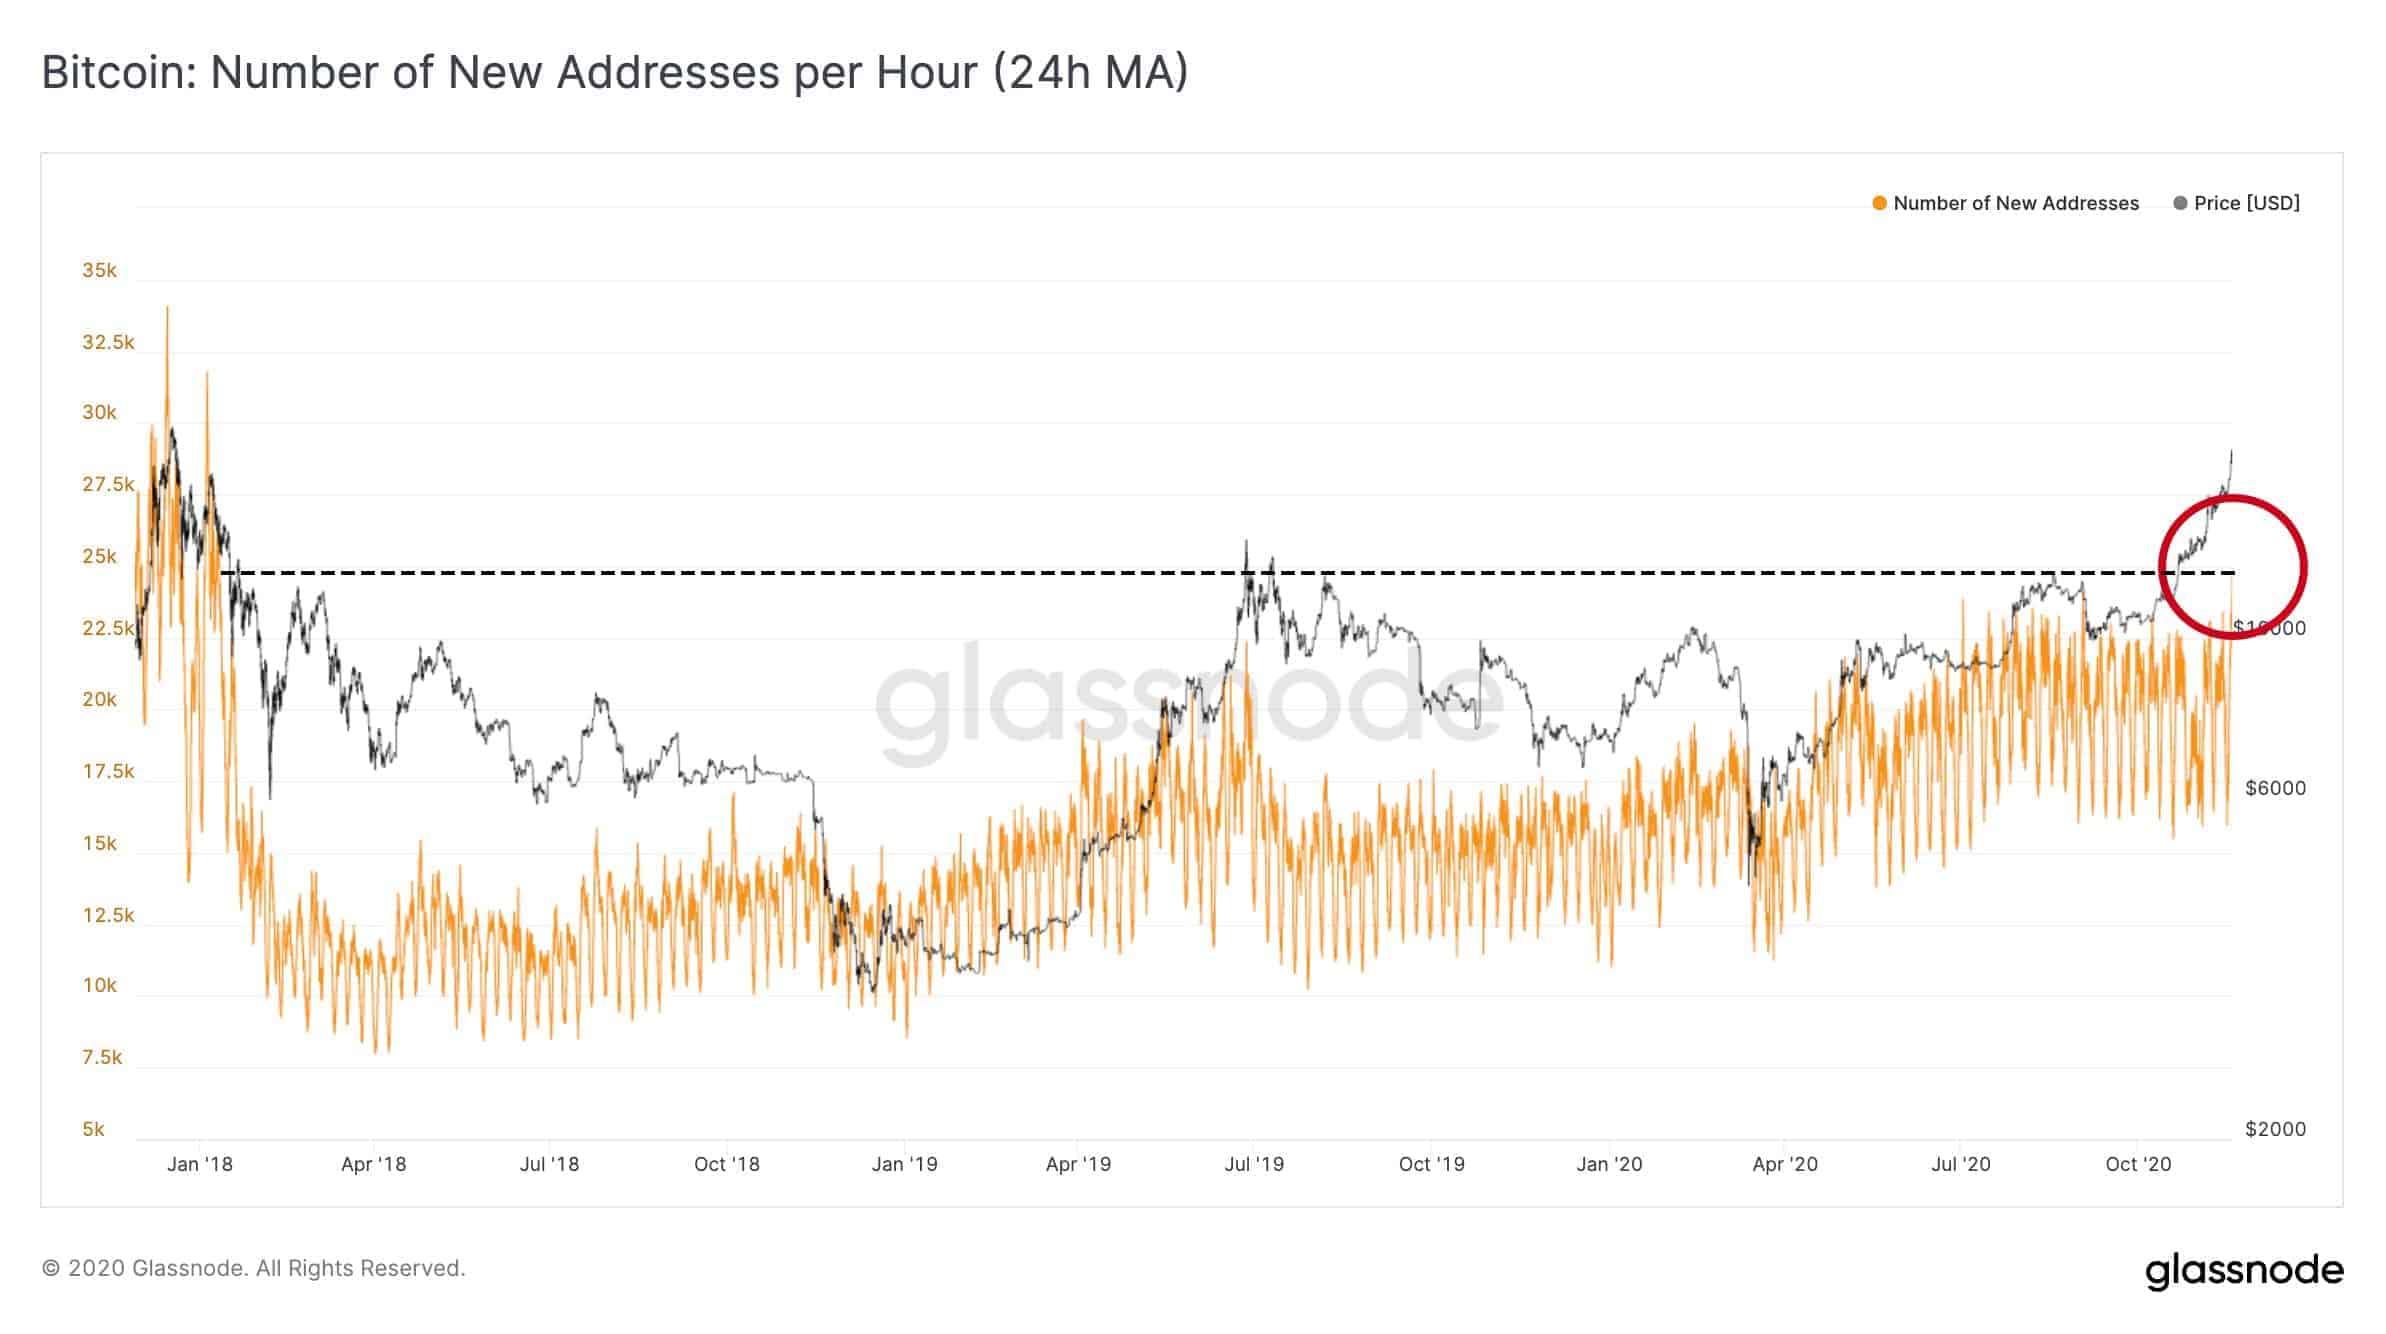 New Addresses On The BTC Network. Source: Glassnode